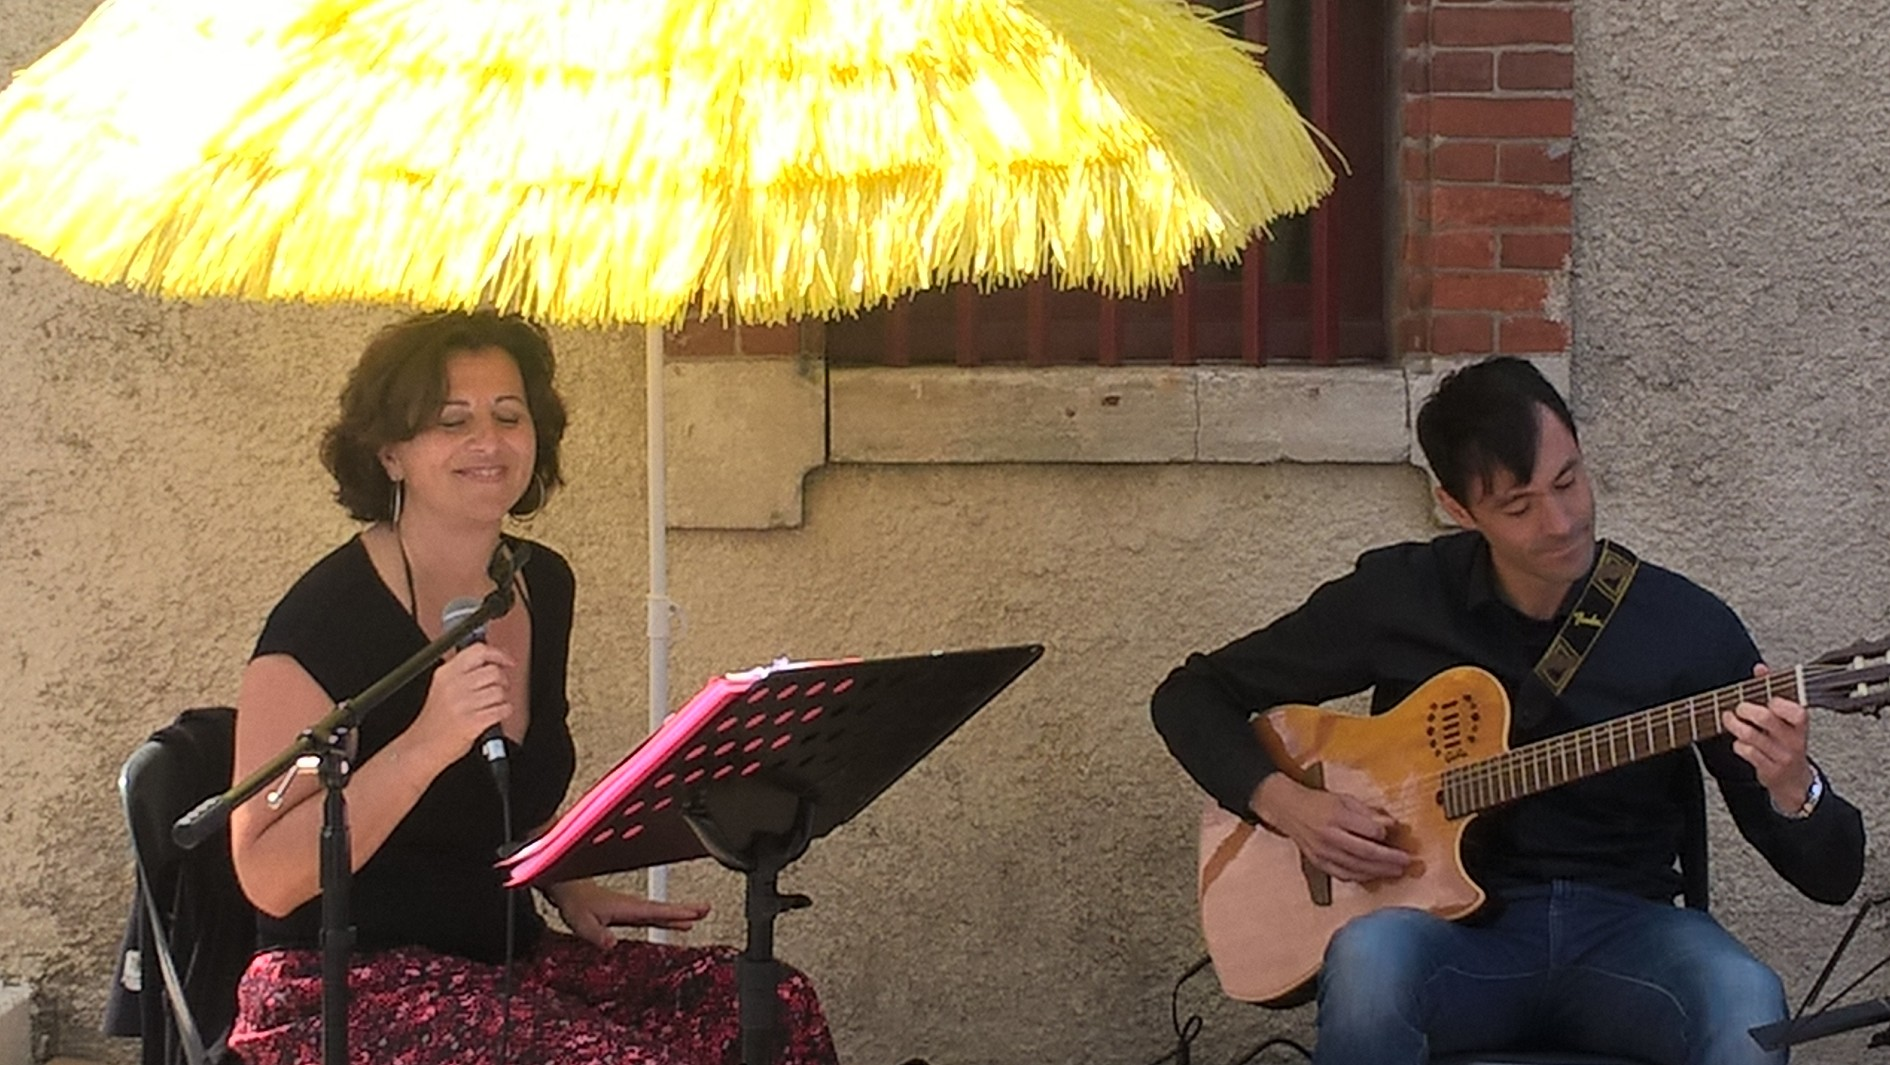 SUNNY ALDE en concert au Barrio le vendredi 23 juin